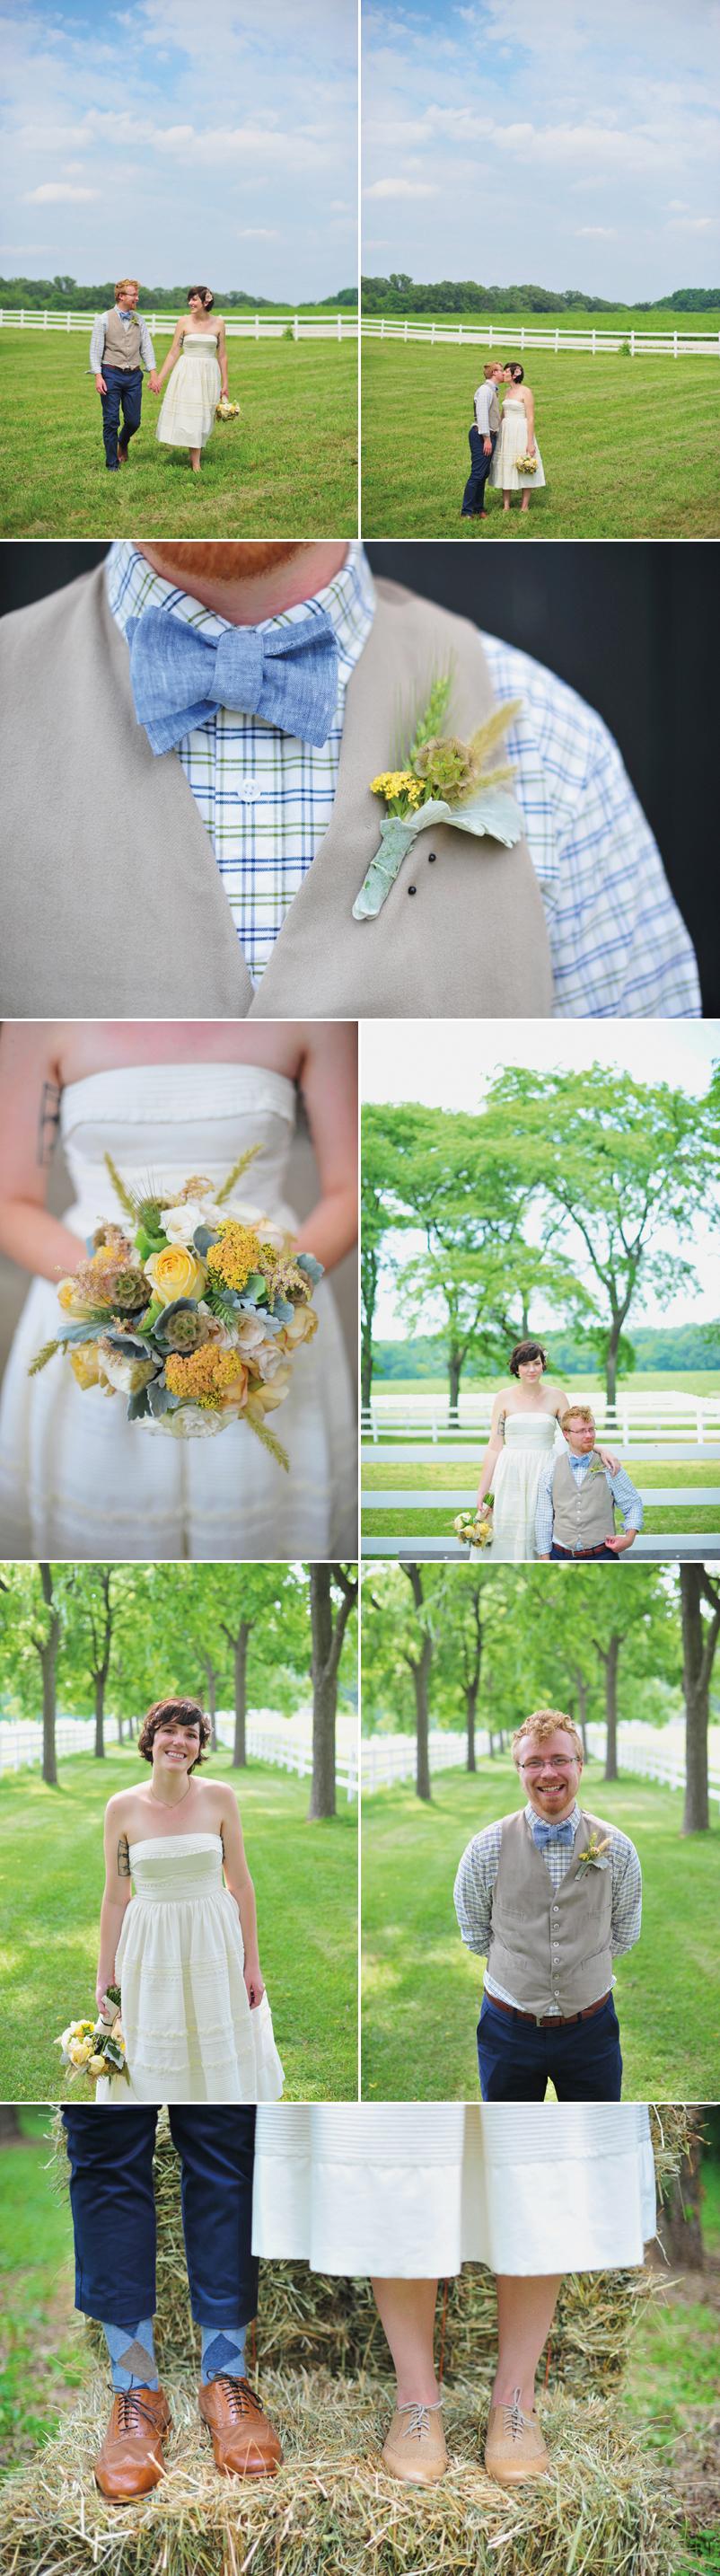 DIY Wedding Chicagoland, Farm Wedding Chicago, Illinois Wedding Photography, Aurora Illinois Wedding Photography, DIY Wedding Chicagoland, Style Me Pretty Chicago Illinois